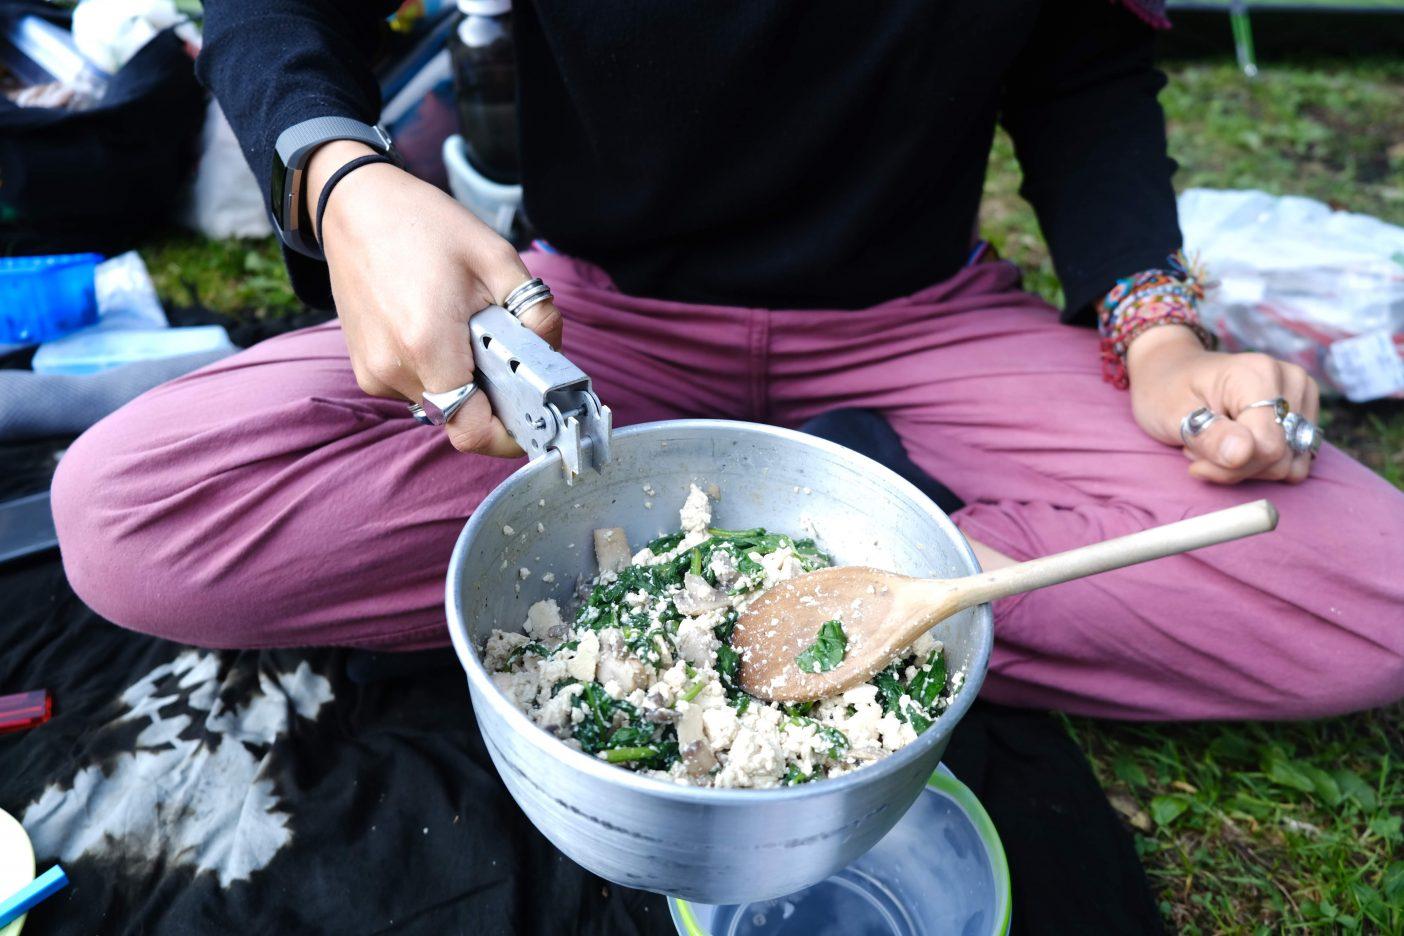 Tofu - great vegan foods with B12